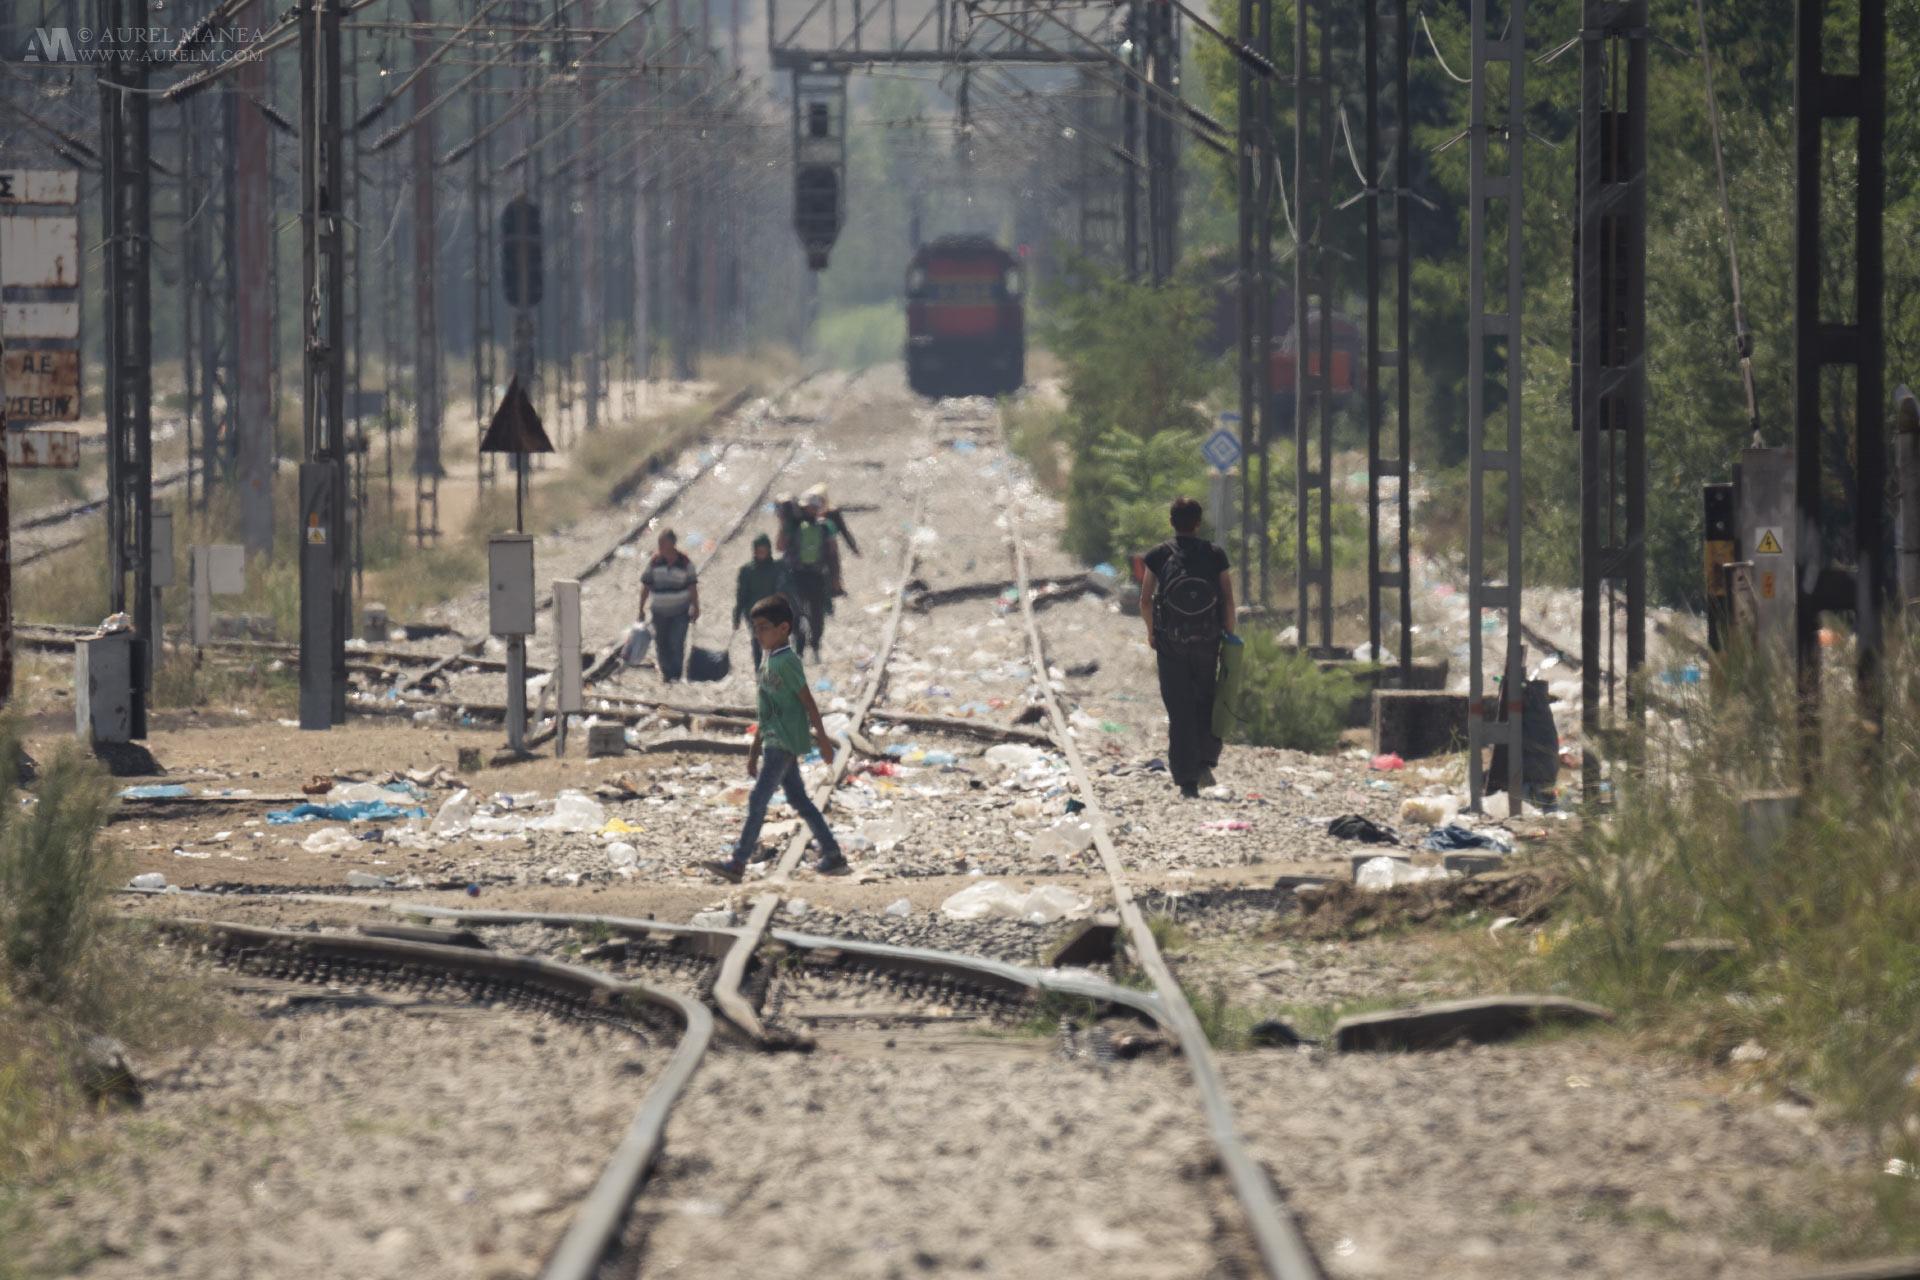 FYROM fears the Balkan route is still active